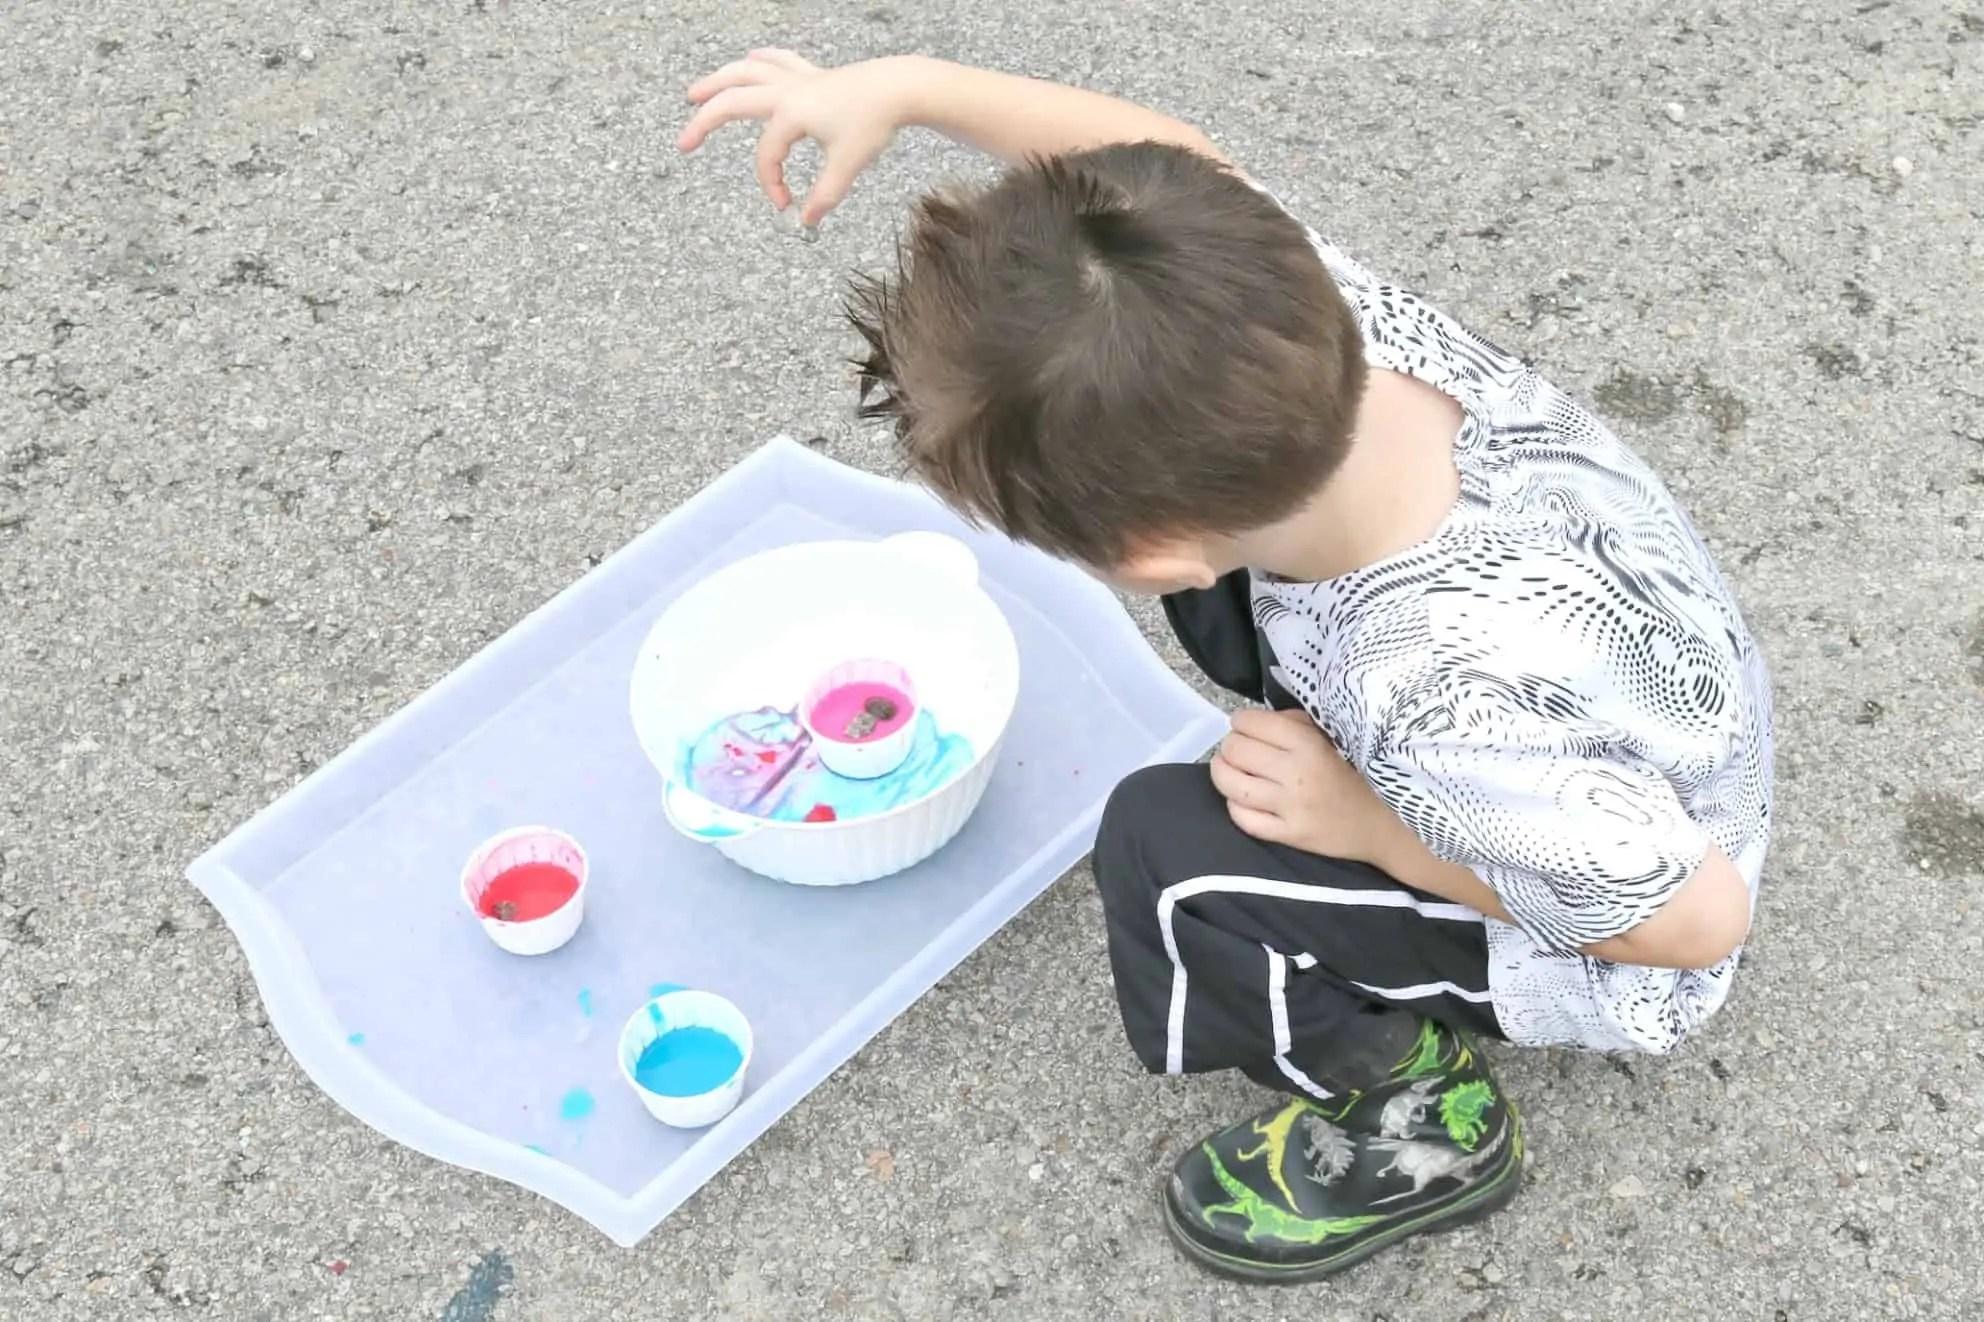 Splash Painting Invitation To Create Process Art Experience